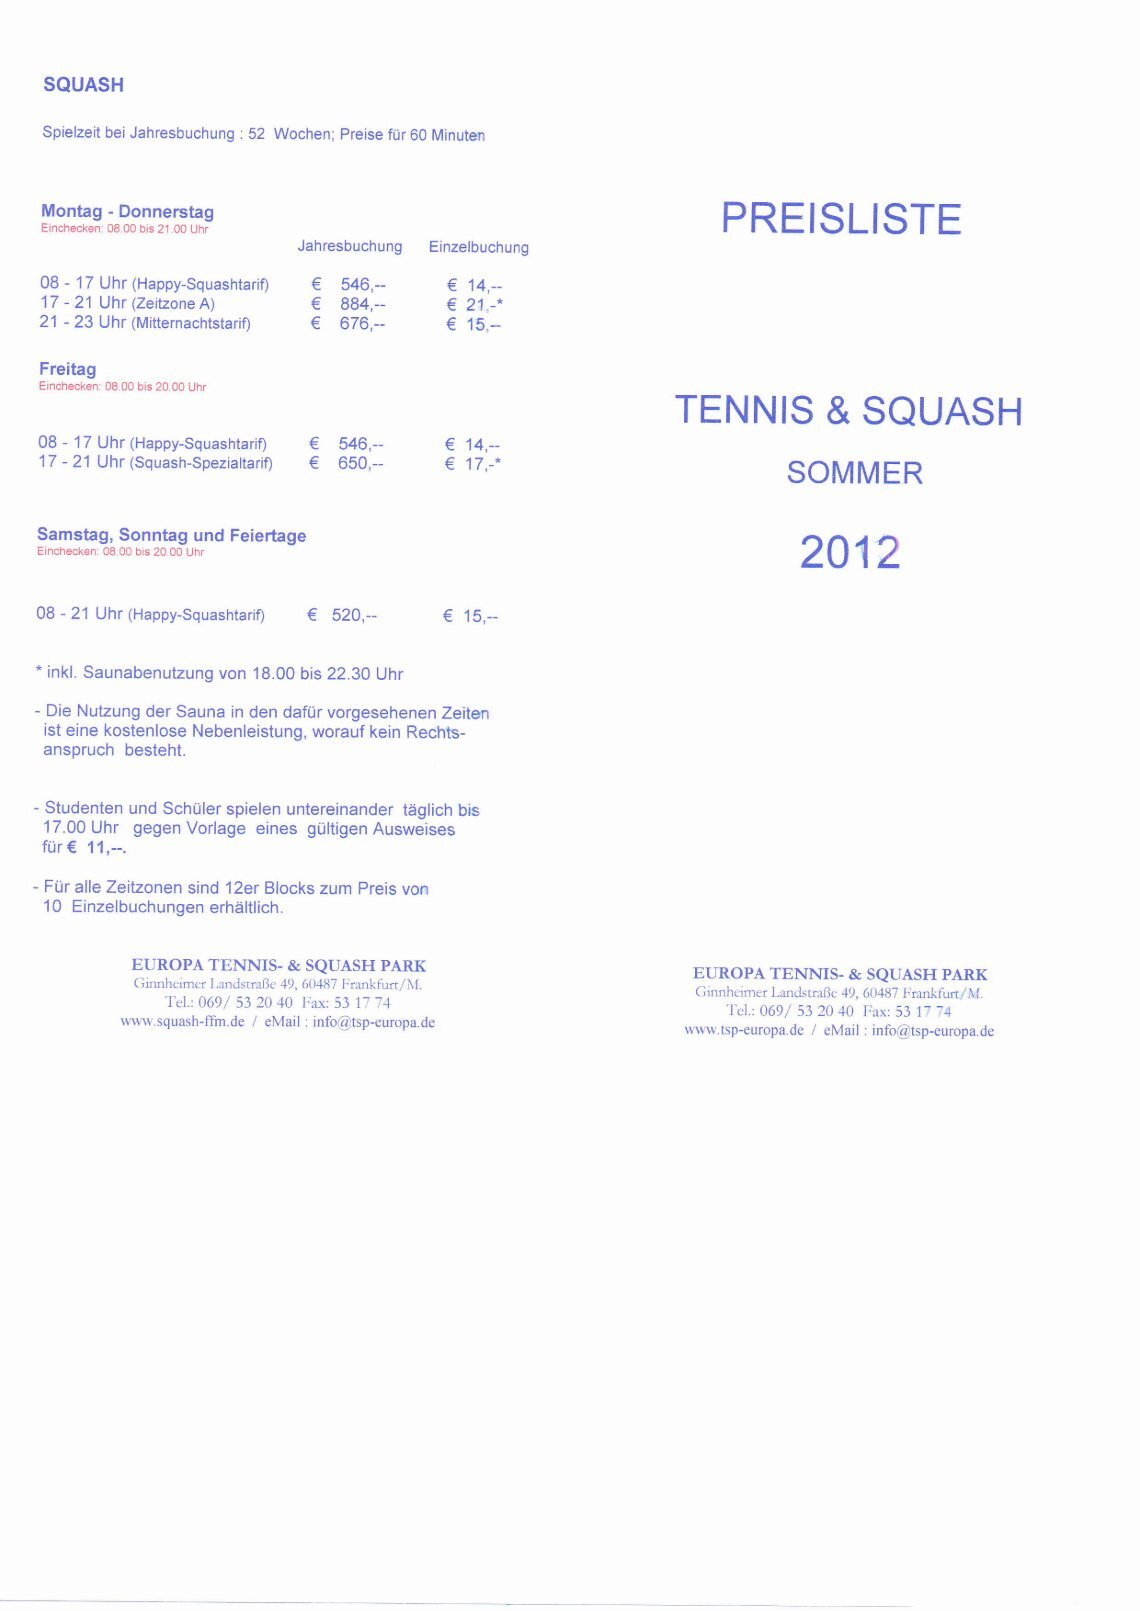 1 free Magazines from TSP.FRANKFURT.DE